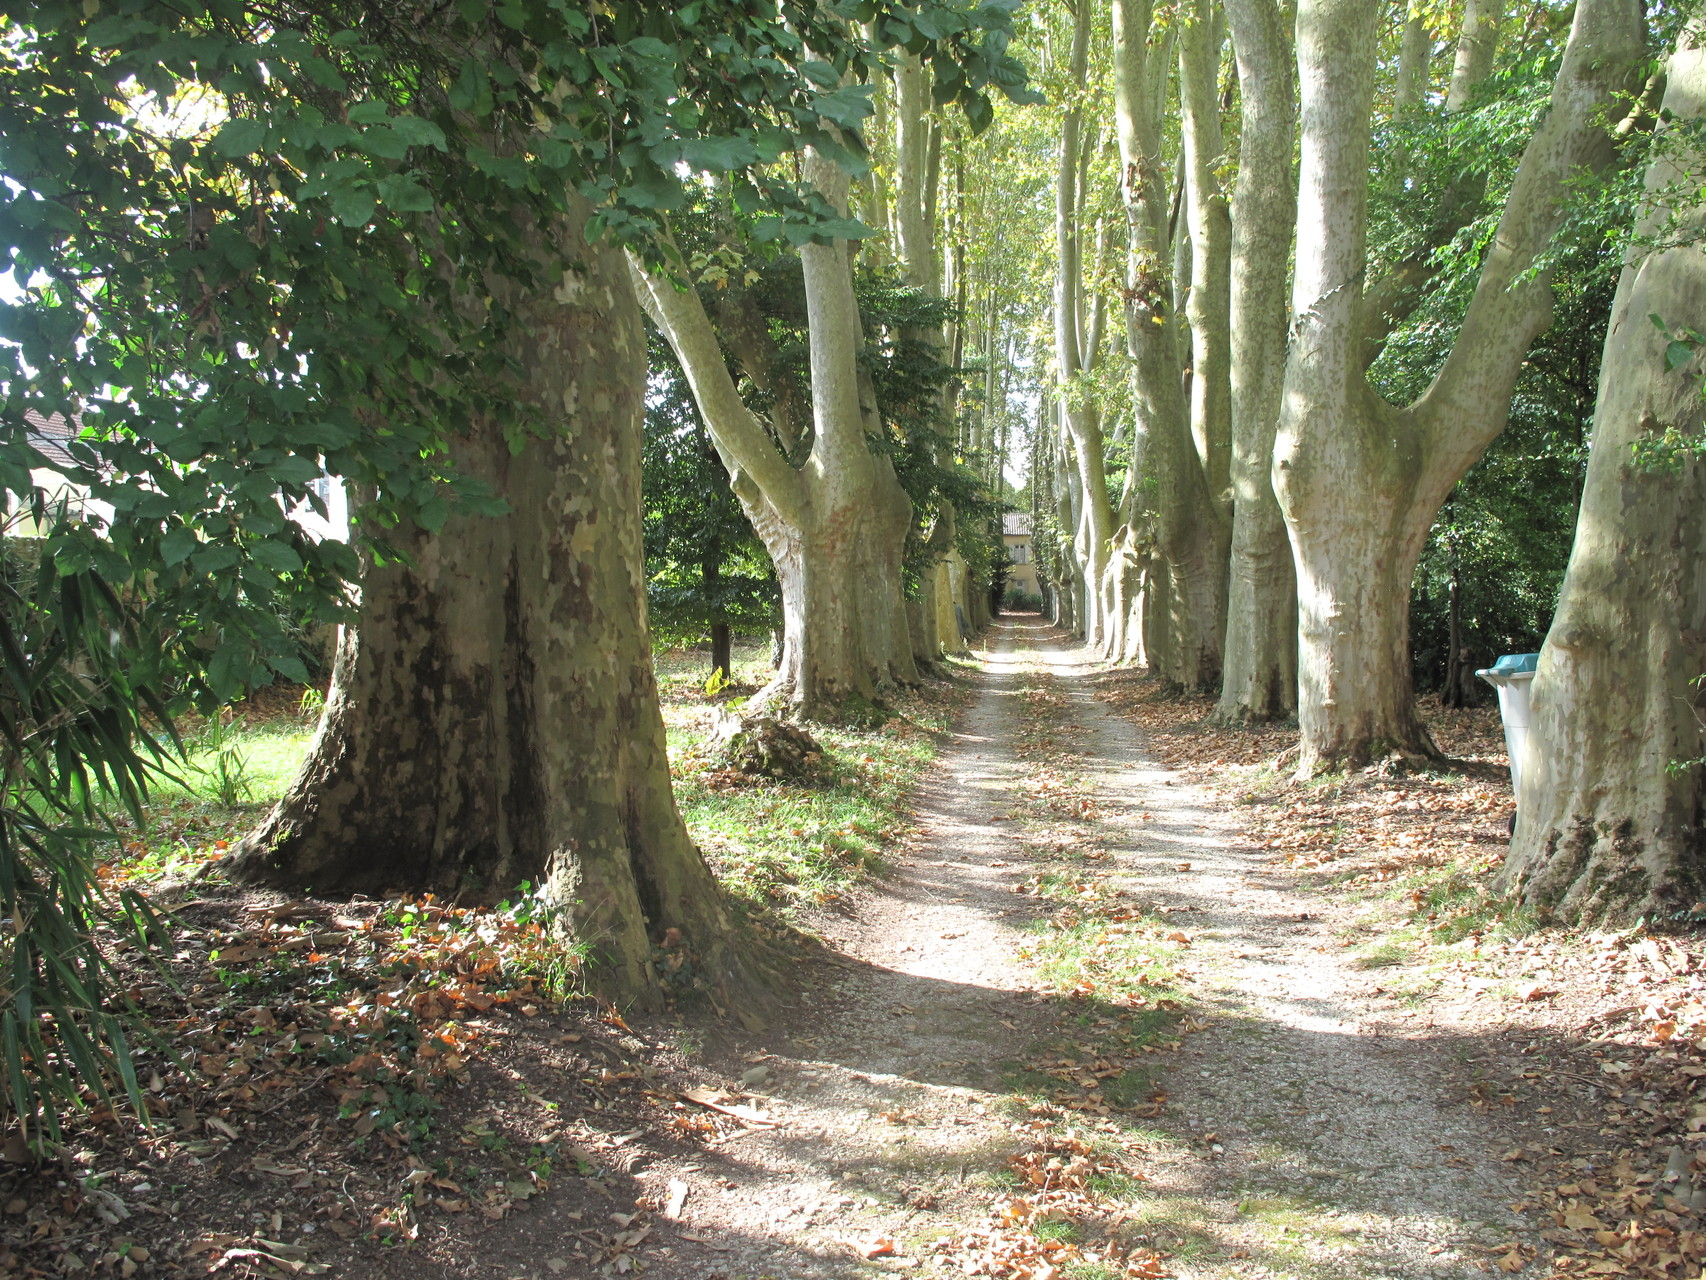 Villeneuve-sur-Lot : l'allée de la villa La Solitude